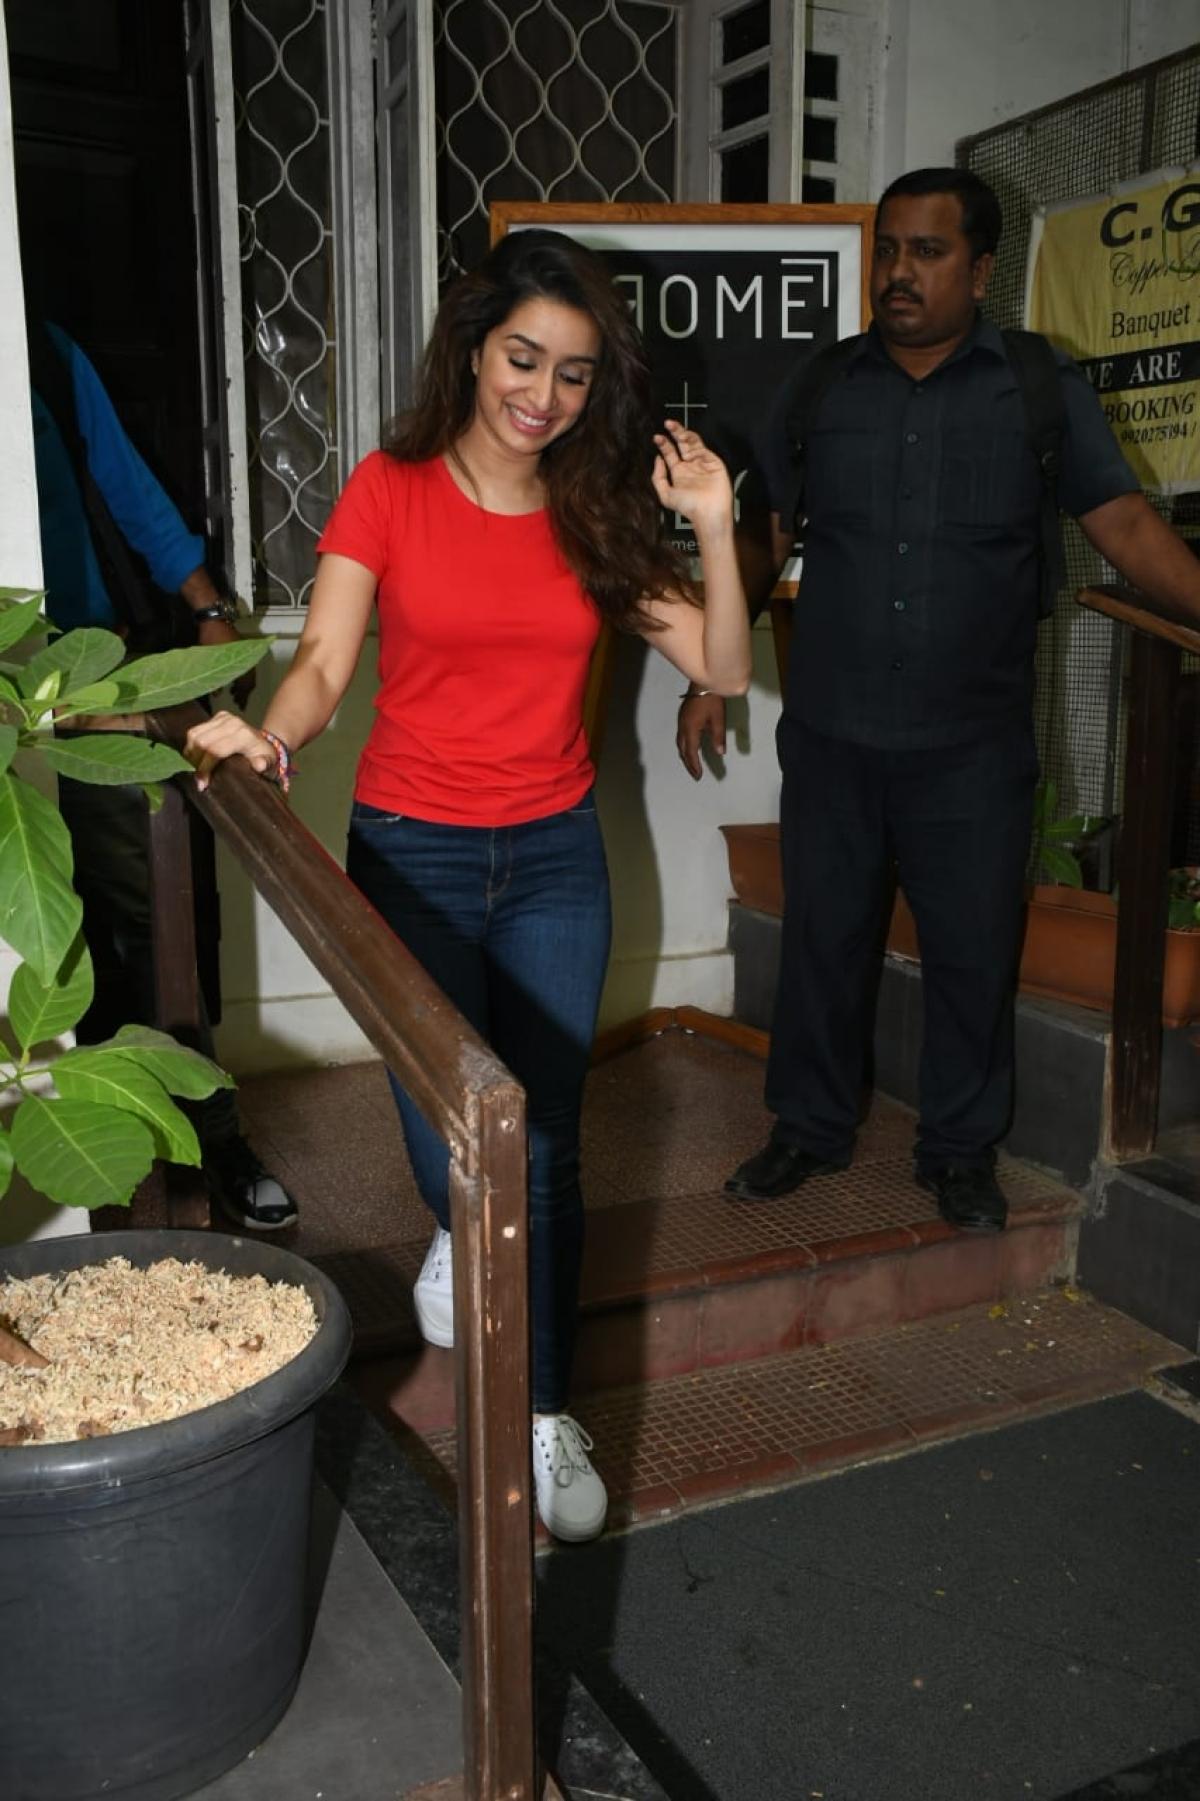 Shraddha Kapoor at Krome Studios, Mumbai